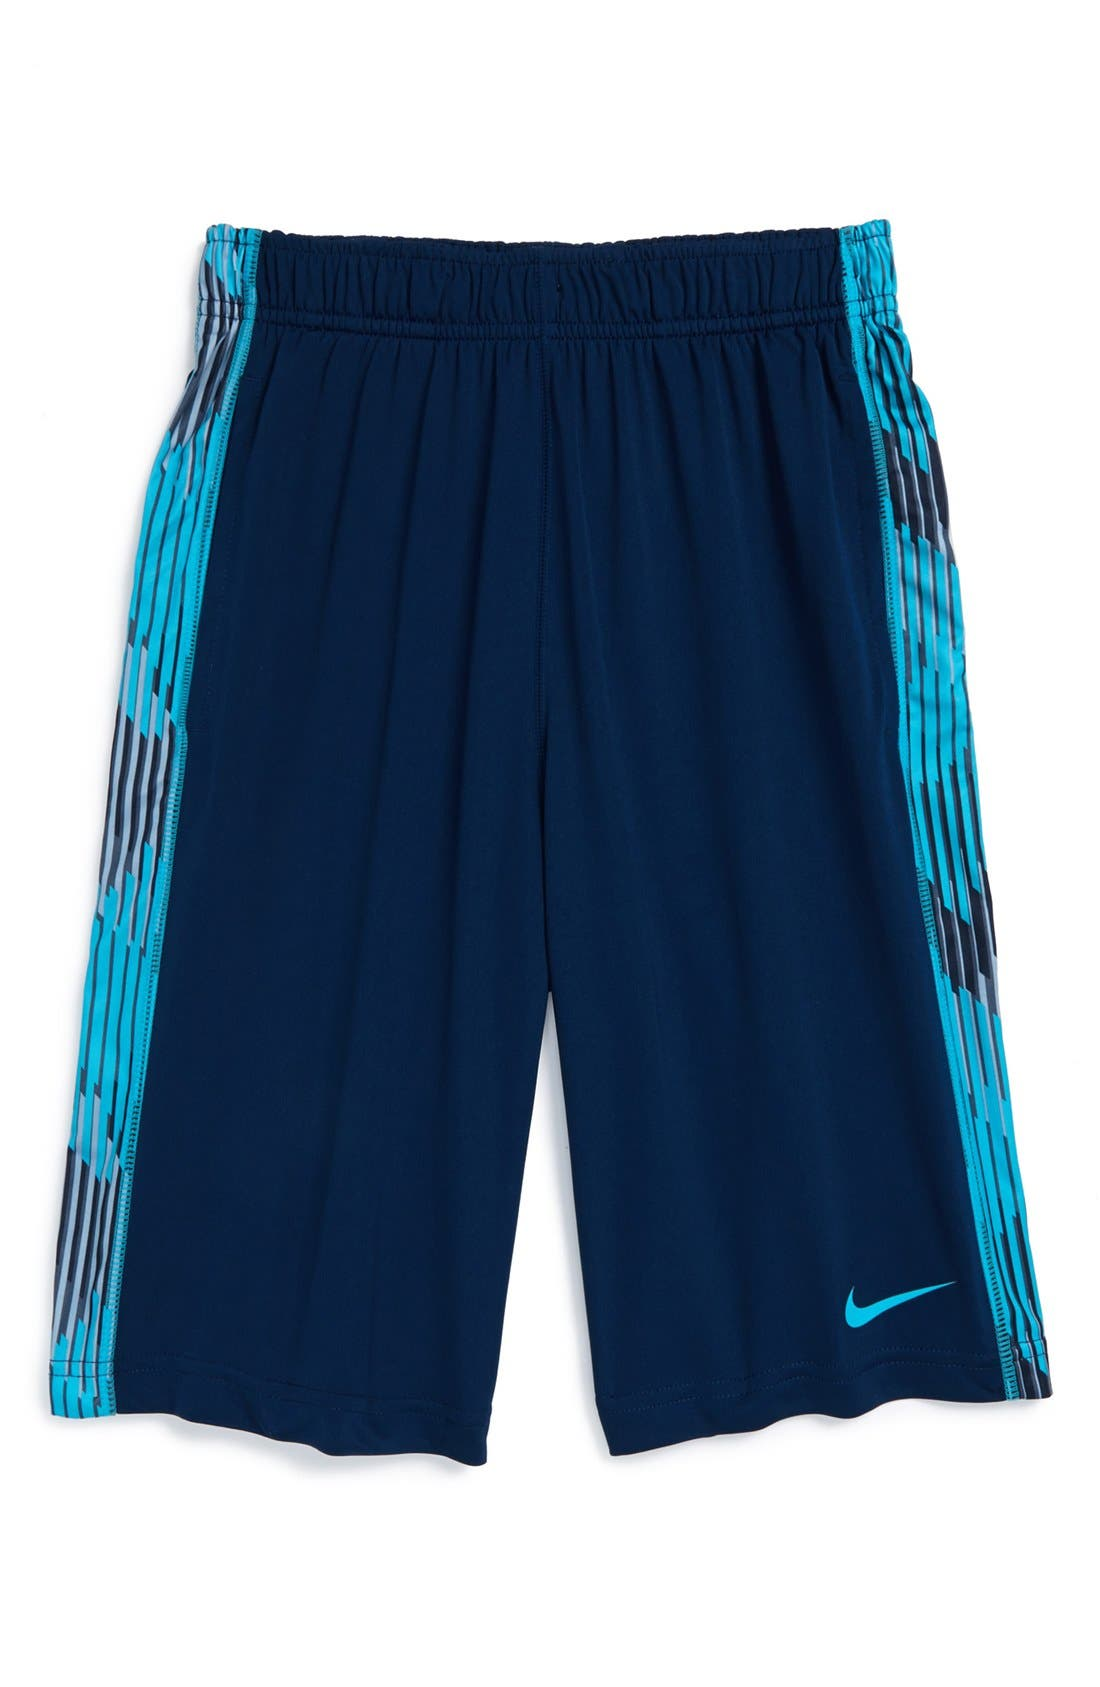 Main Image - Nike 'Fly GFX' Shorts (Big Boys)